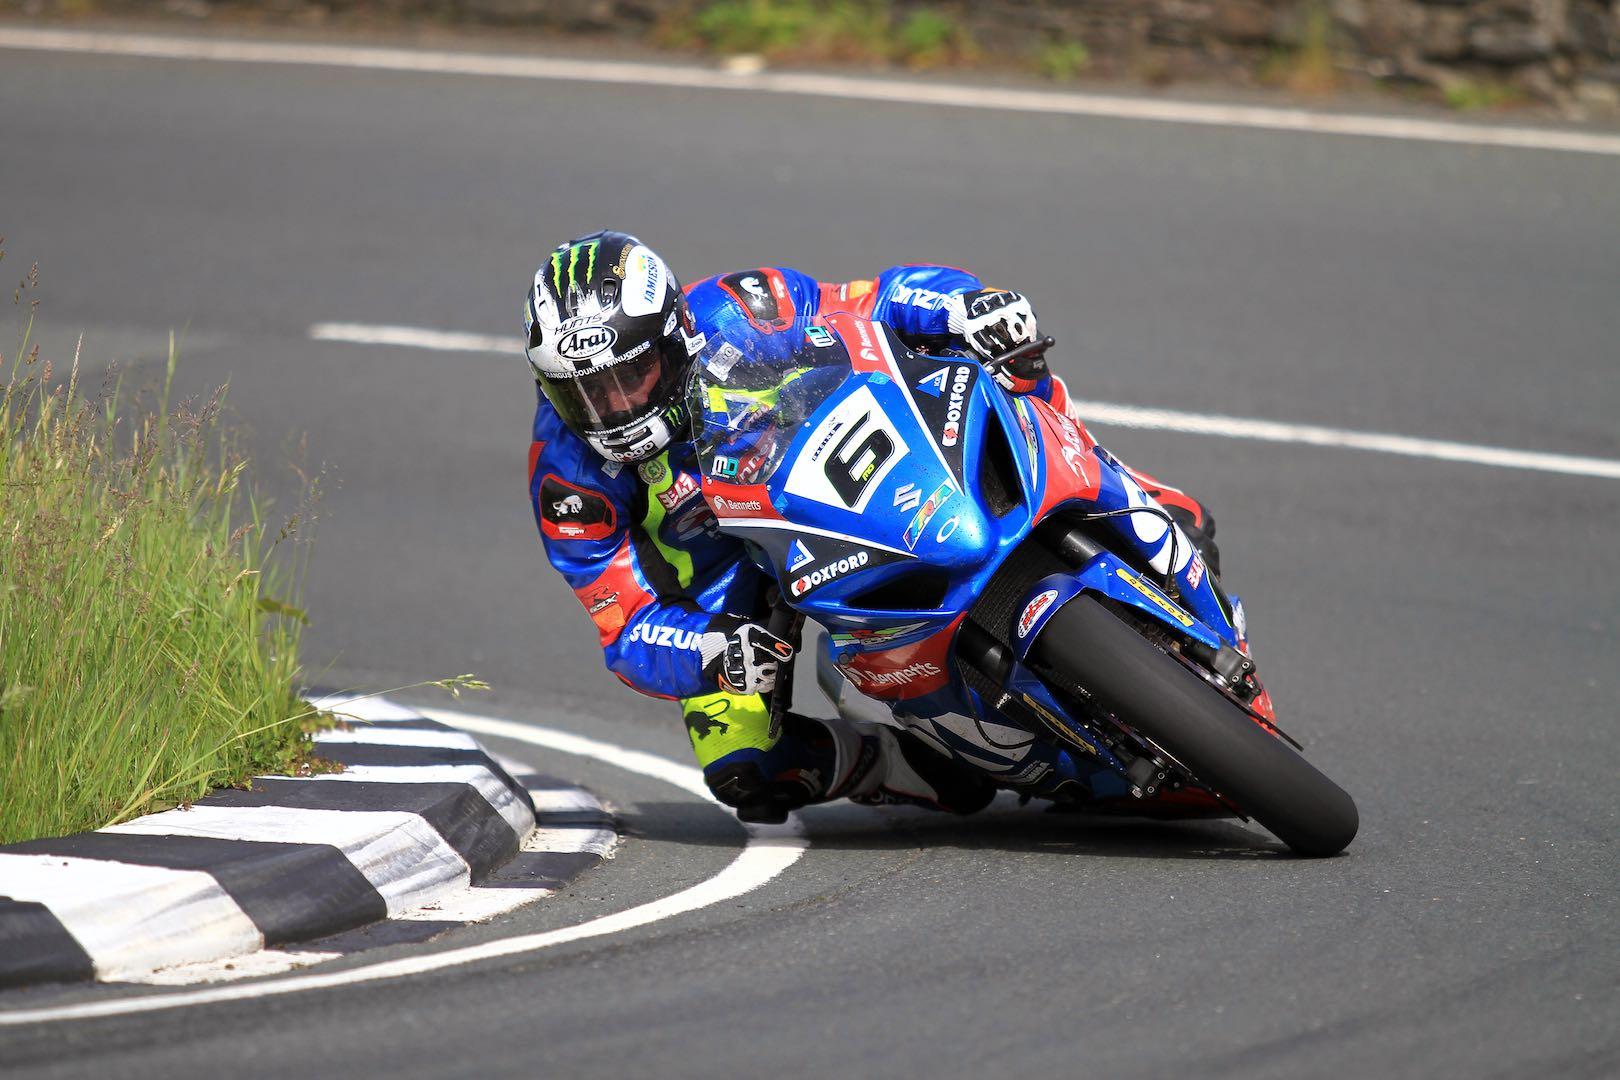 2017 Isle of Man TT Senior Race Results: Suzuki's Michael Dunlop